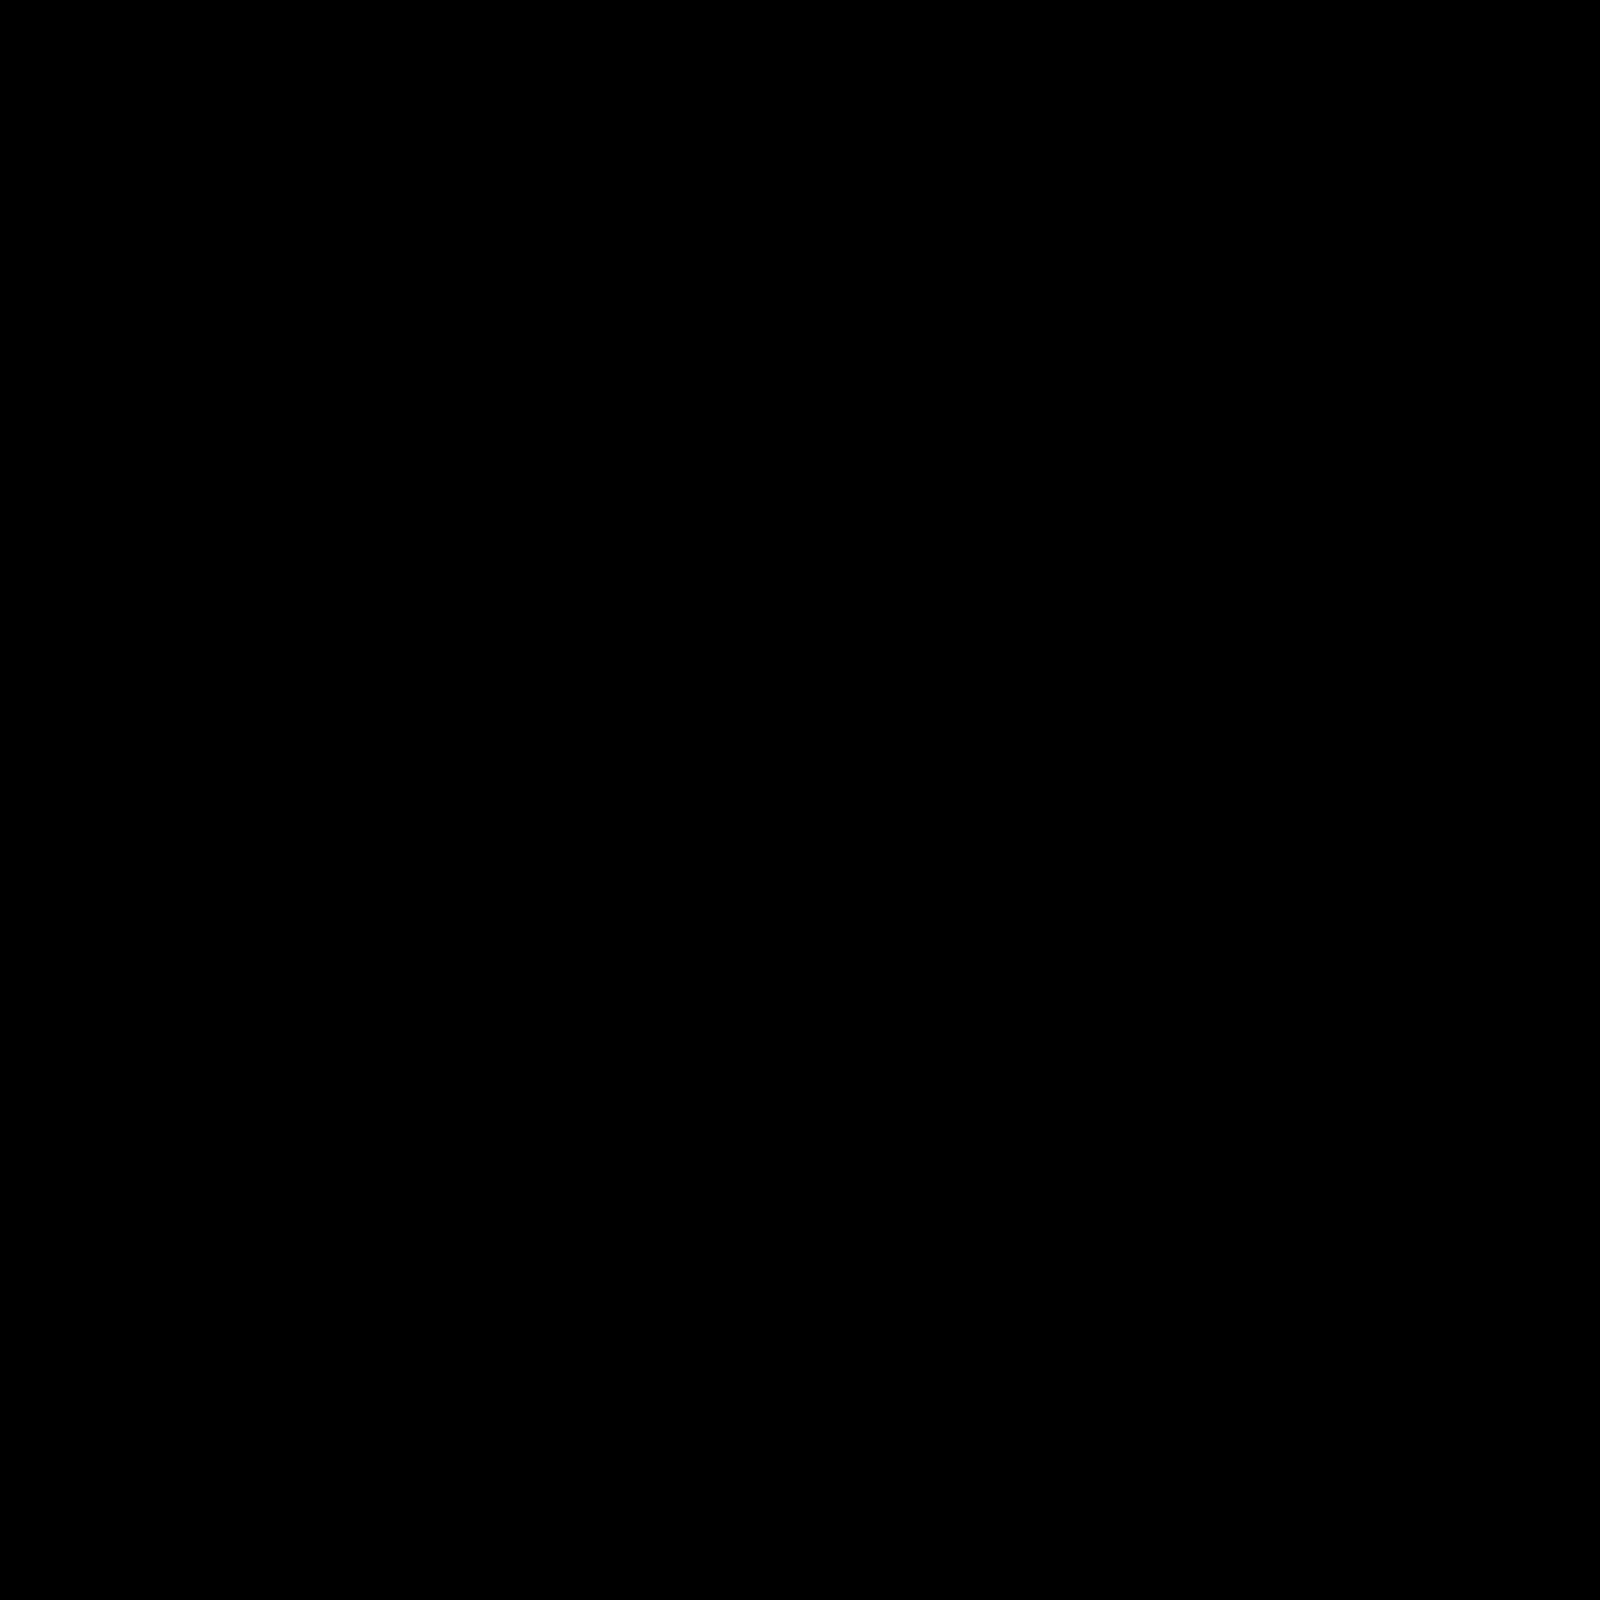 Align Text Center icon